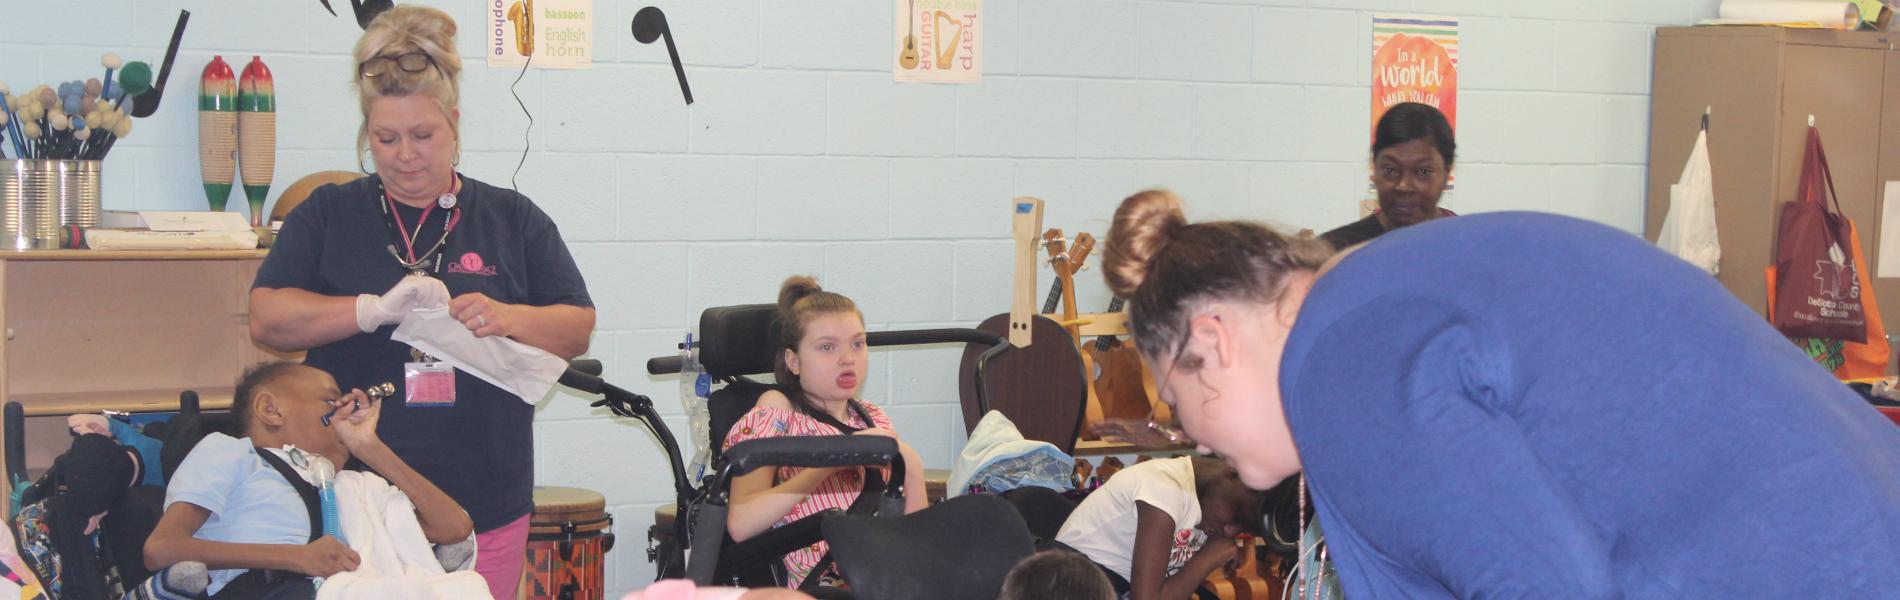 CBC in Music class